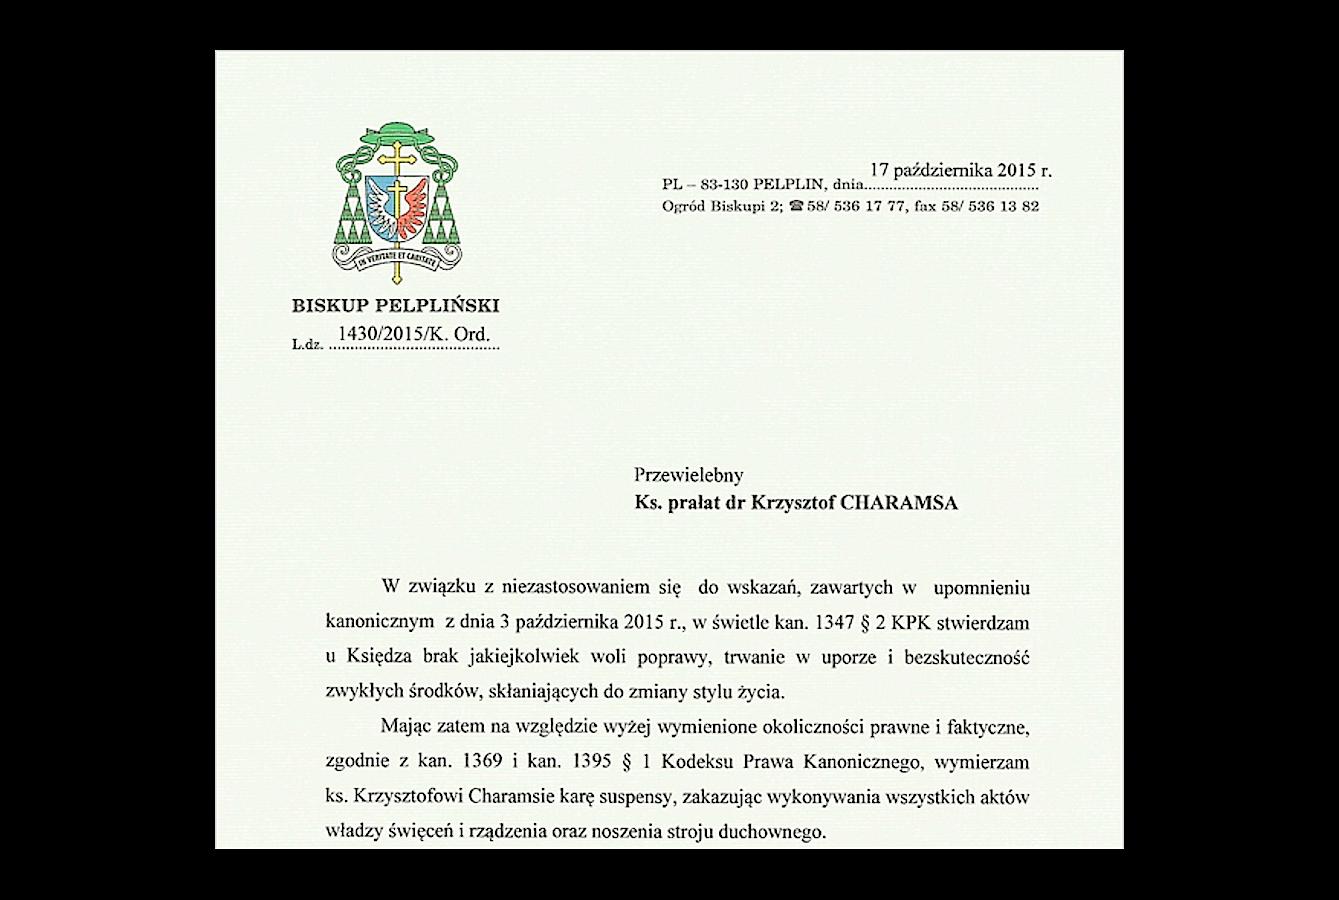 Letter of the Bishop of Pelplin